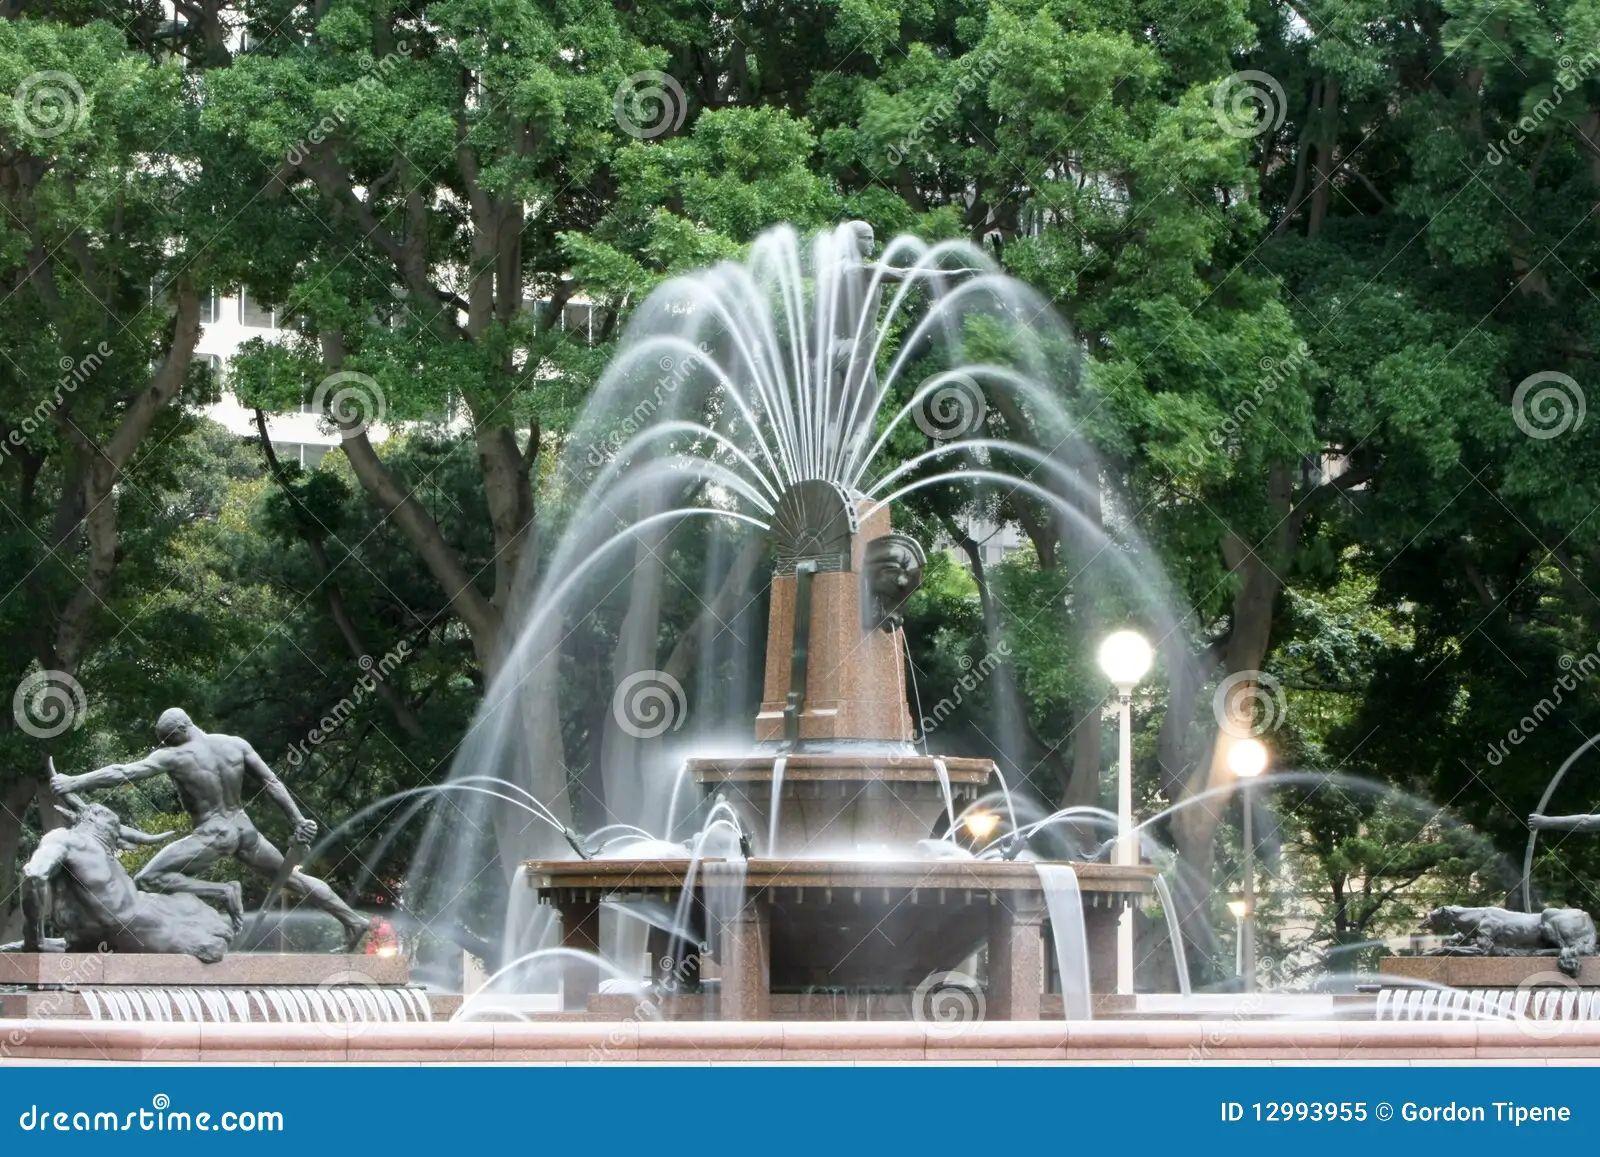 Water fountain hyde park sydney australia